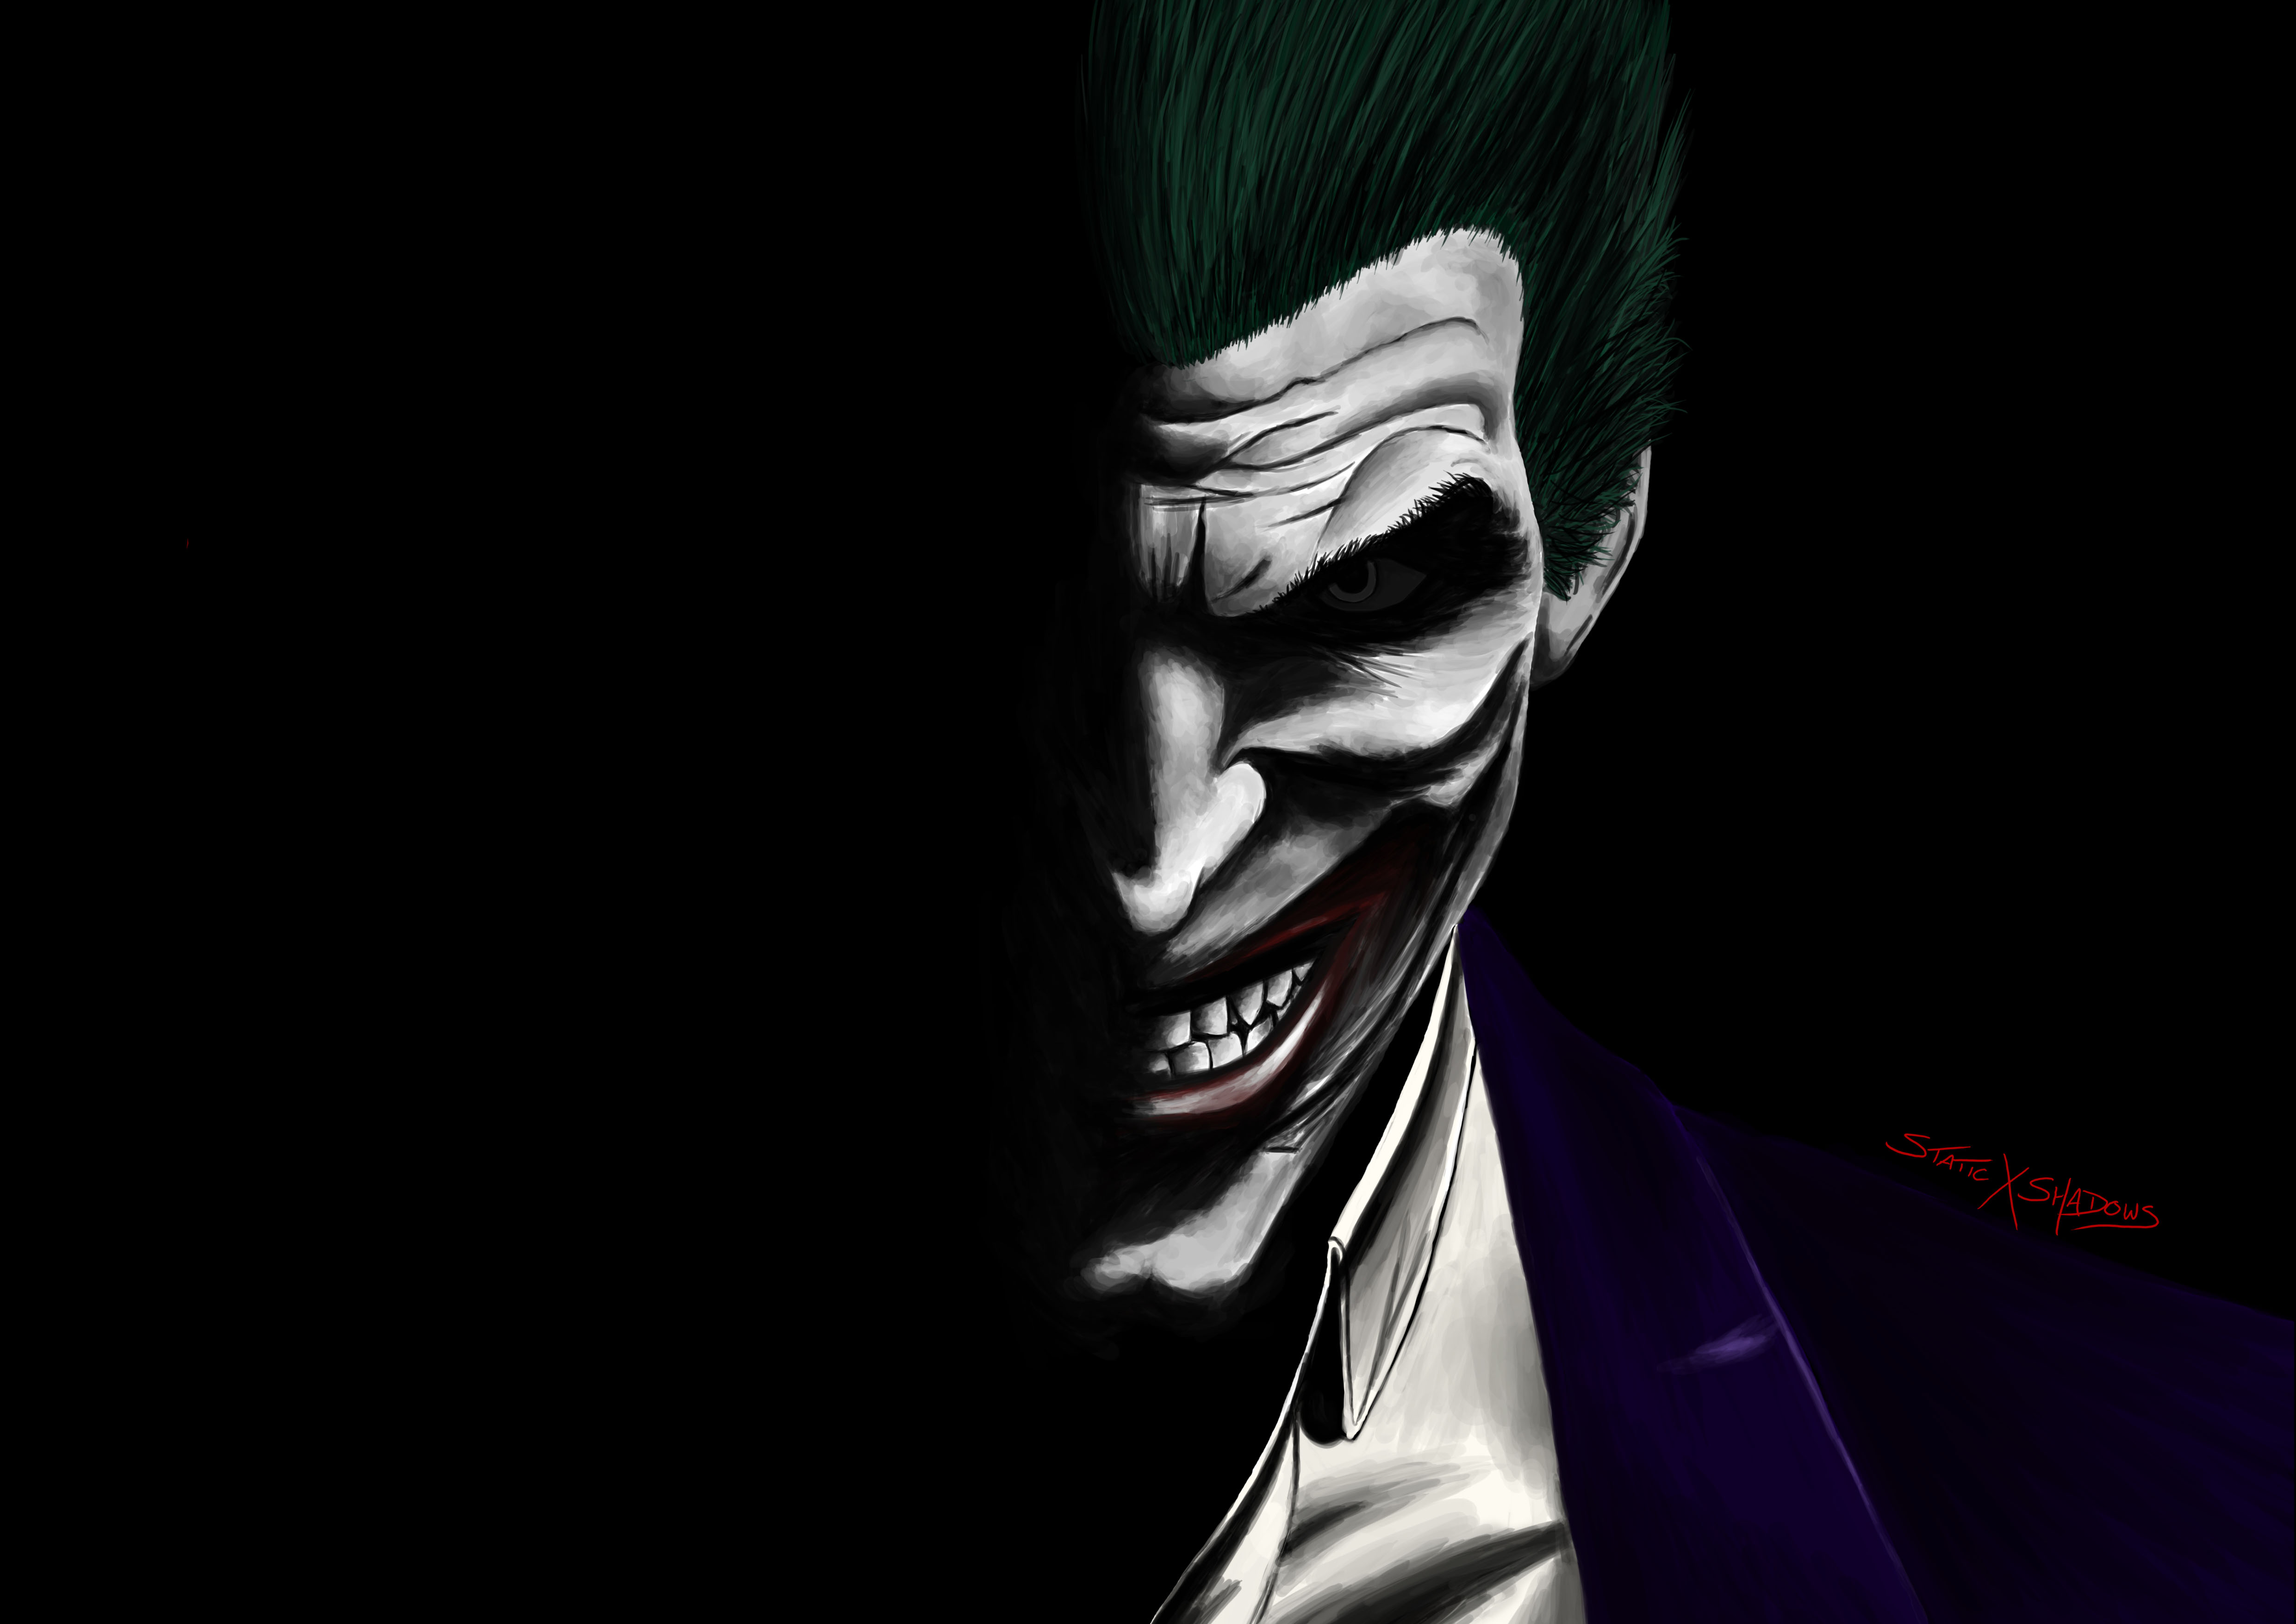 Joker Wall Paper